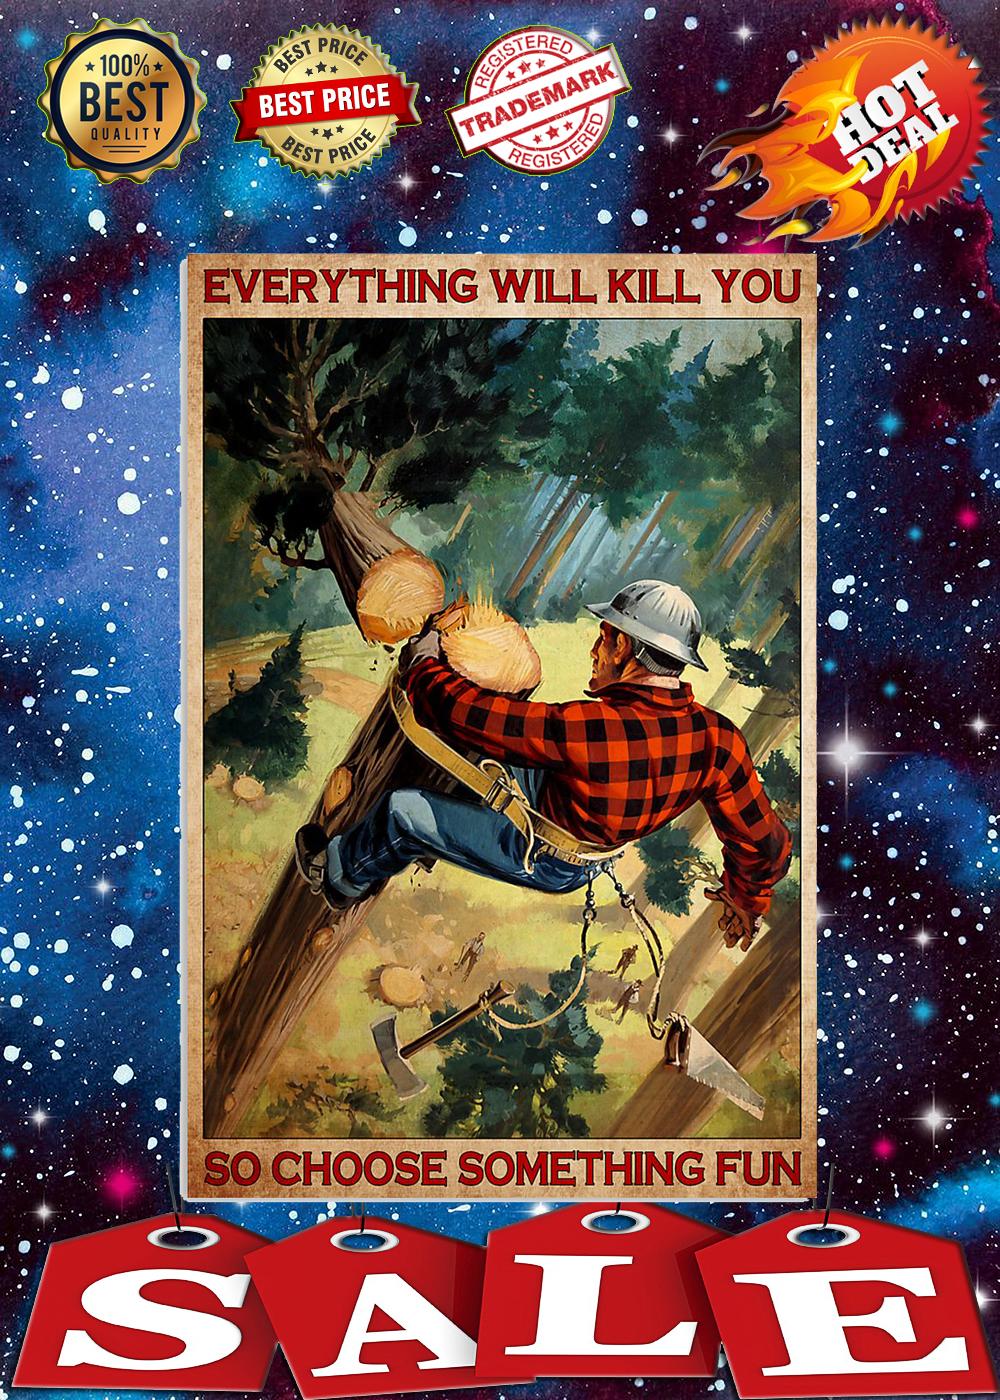 Lumberjack everything will kill you so choose something fun poster 1